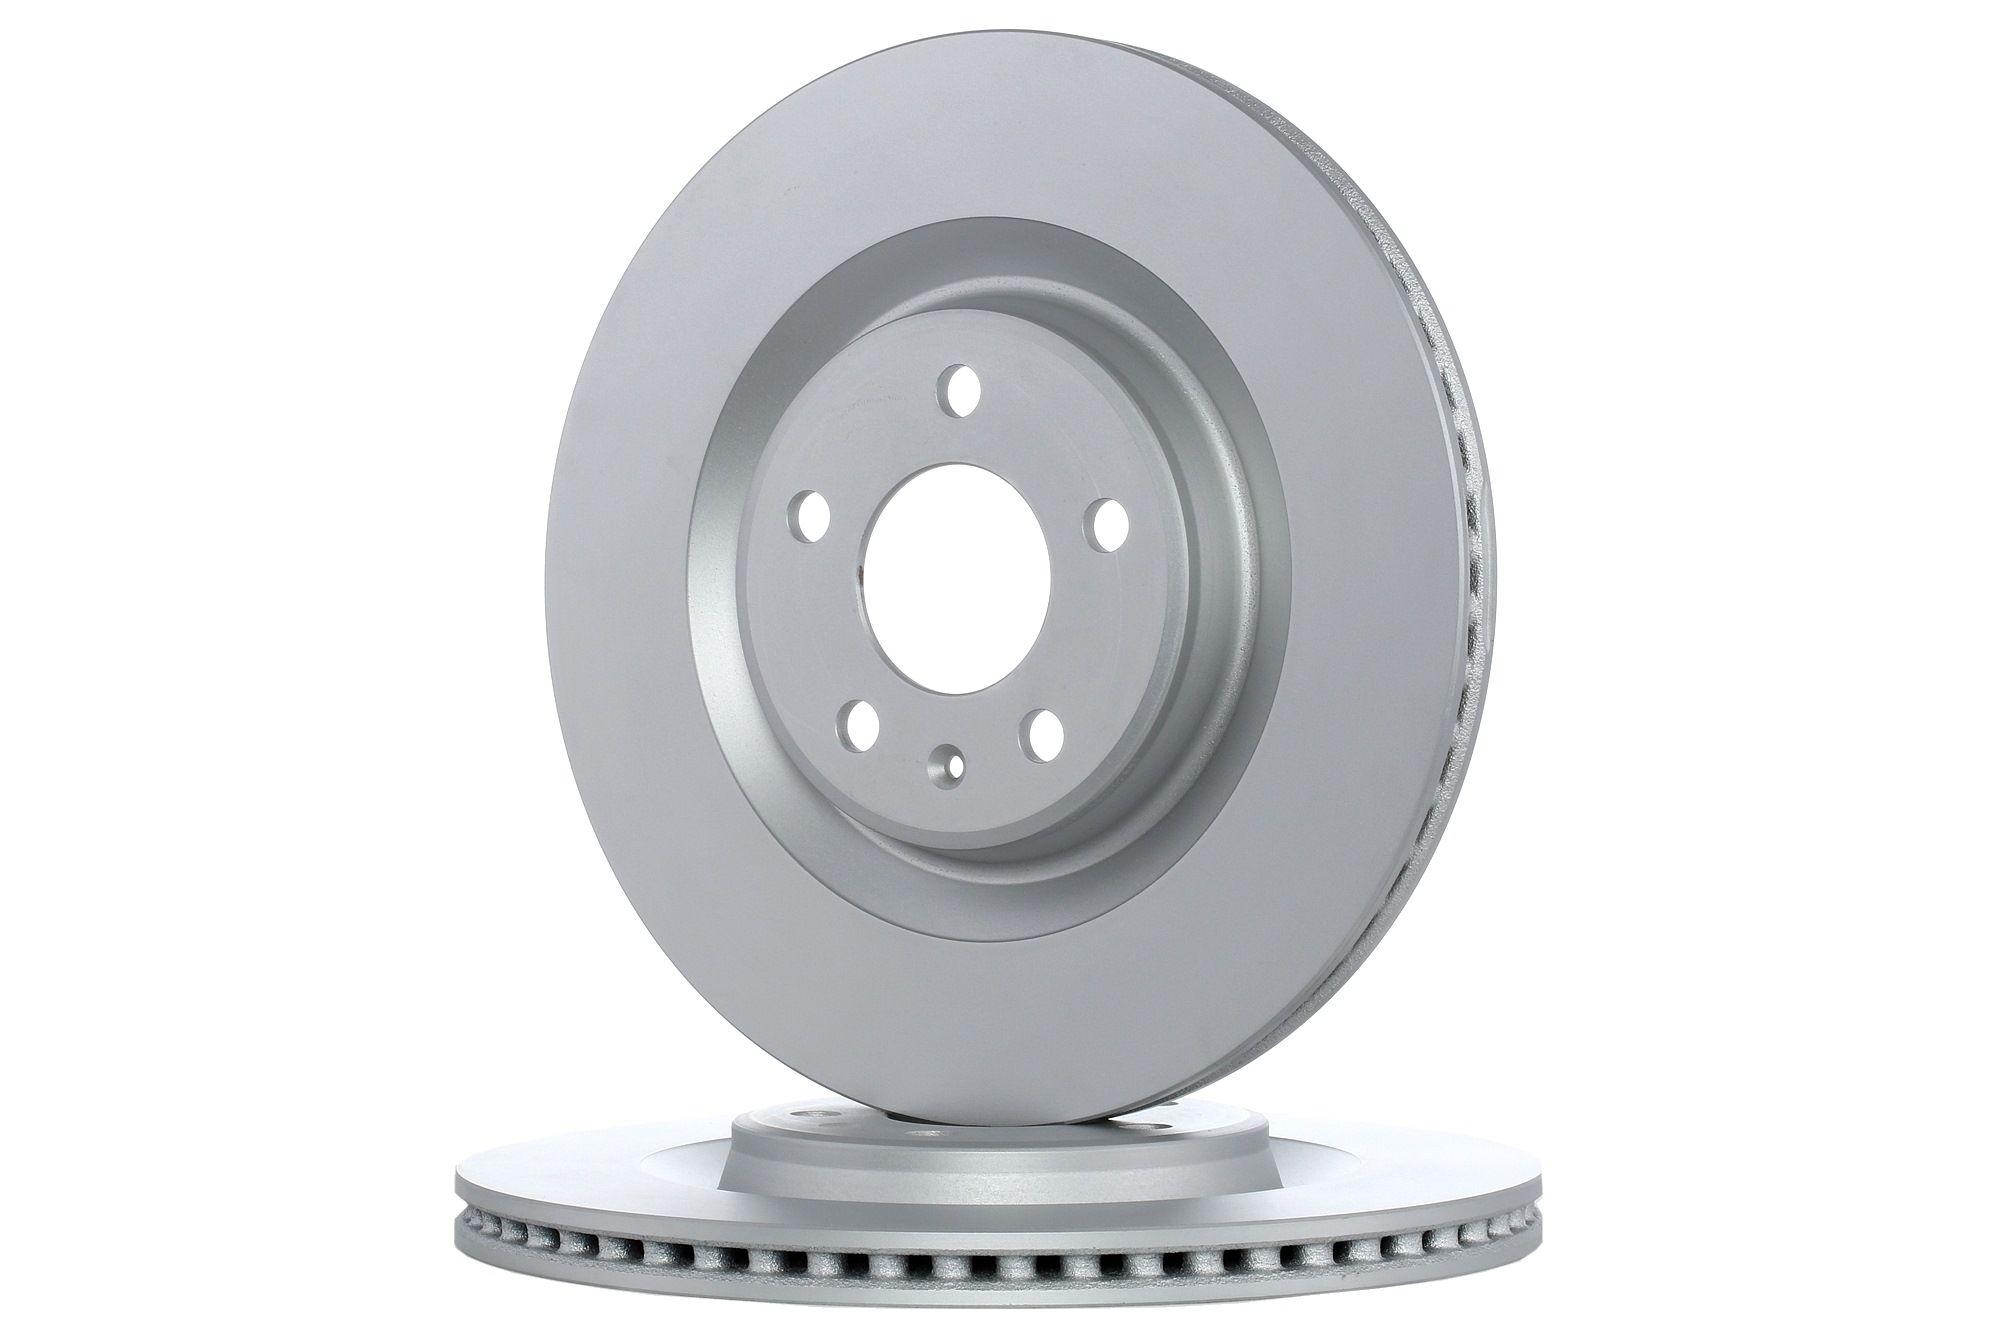 VW Disque de frein d'Origine 0 986 479 750